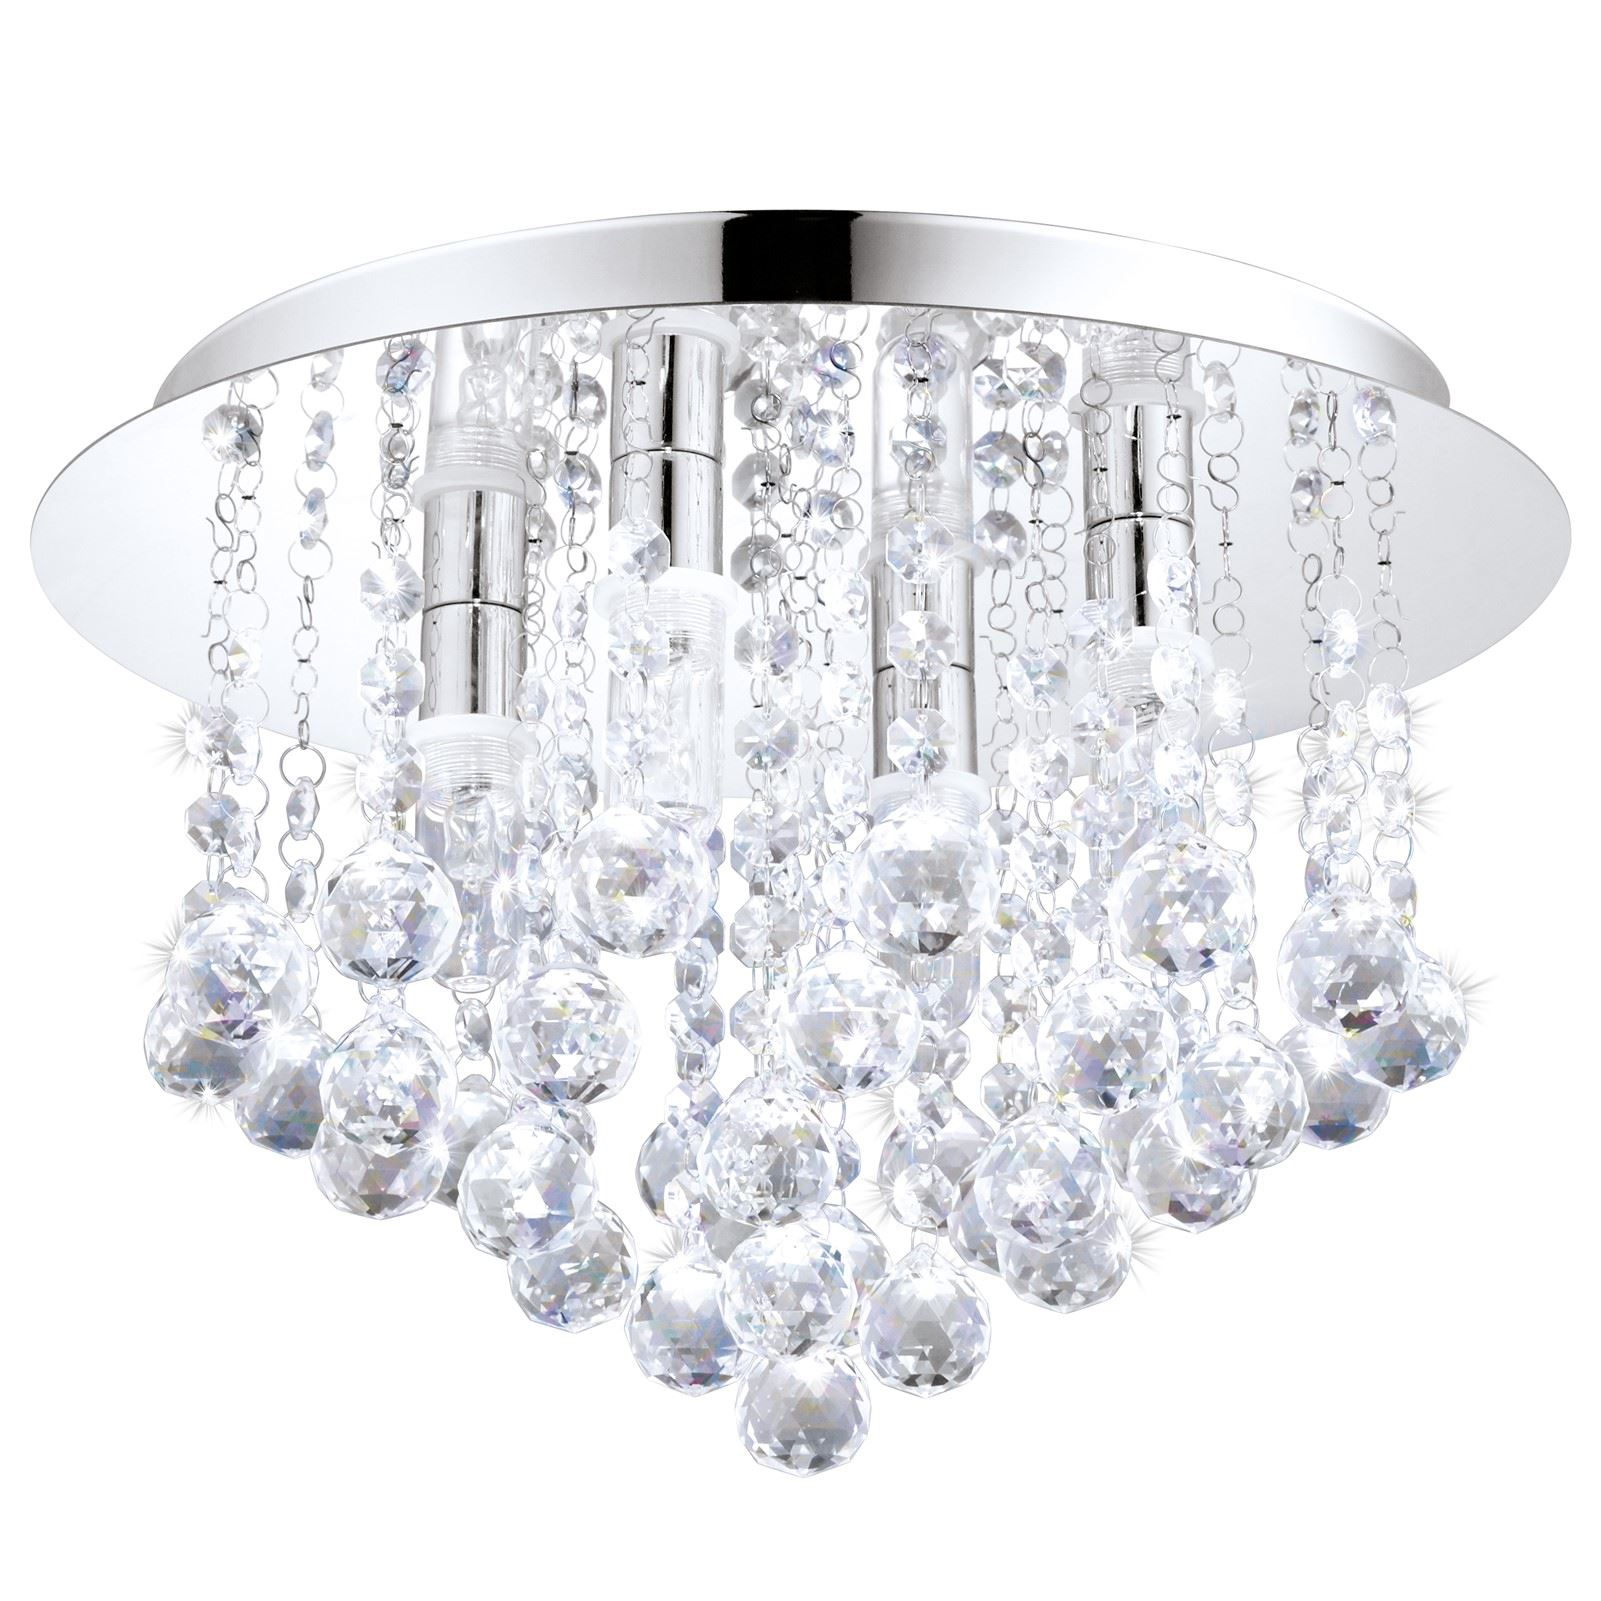 ALMONTE Decorative 4 Ceiling Light G9 Chrome Crystal